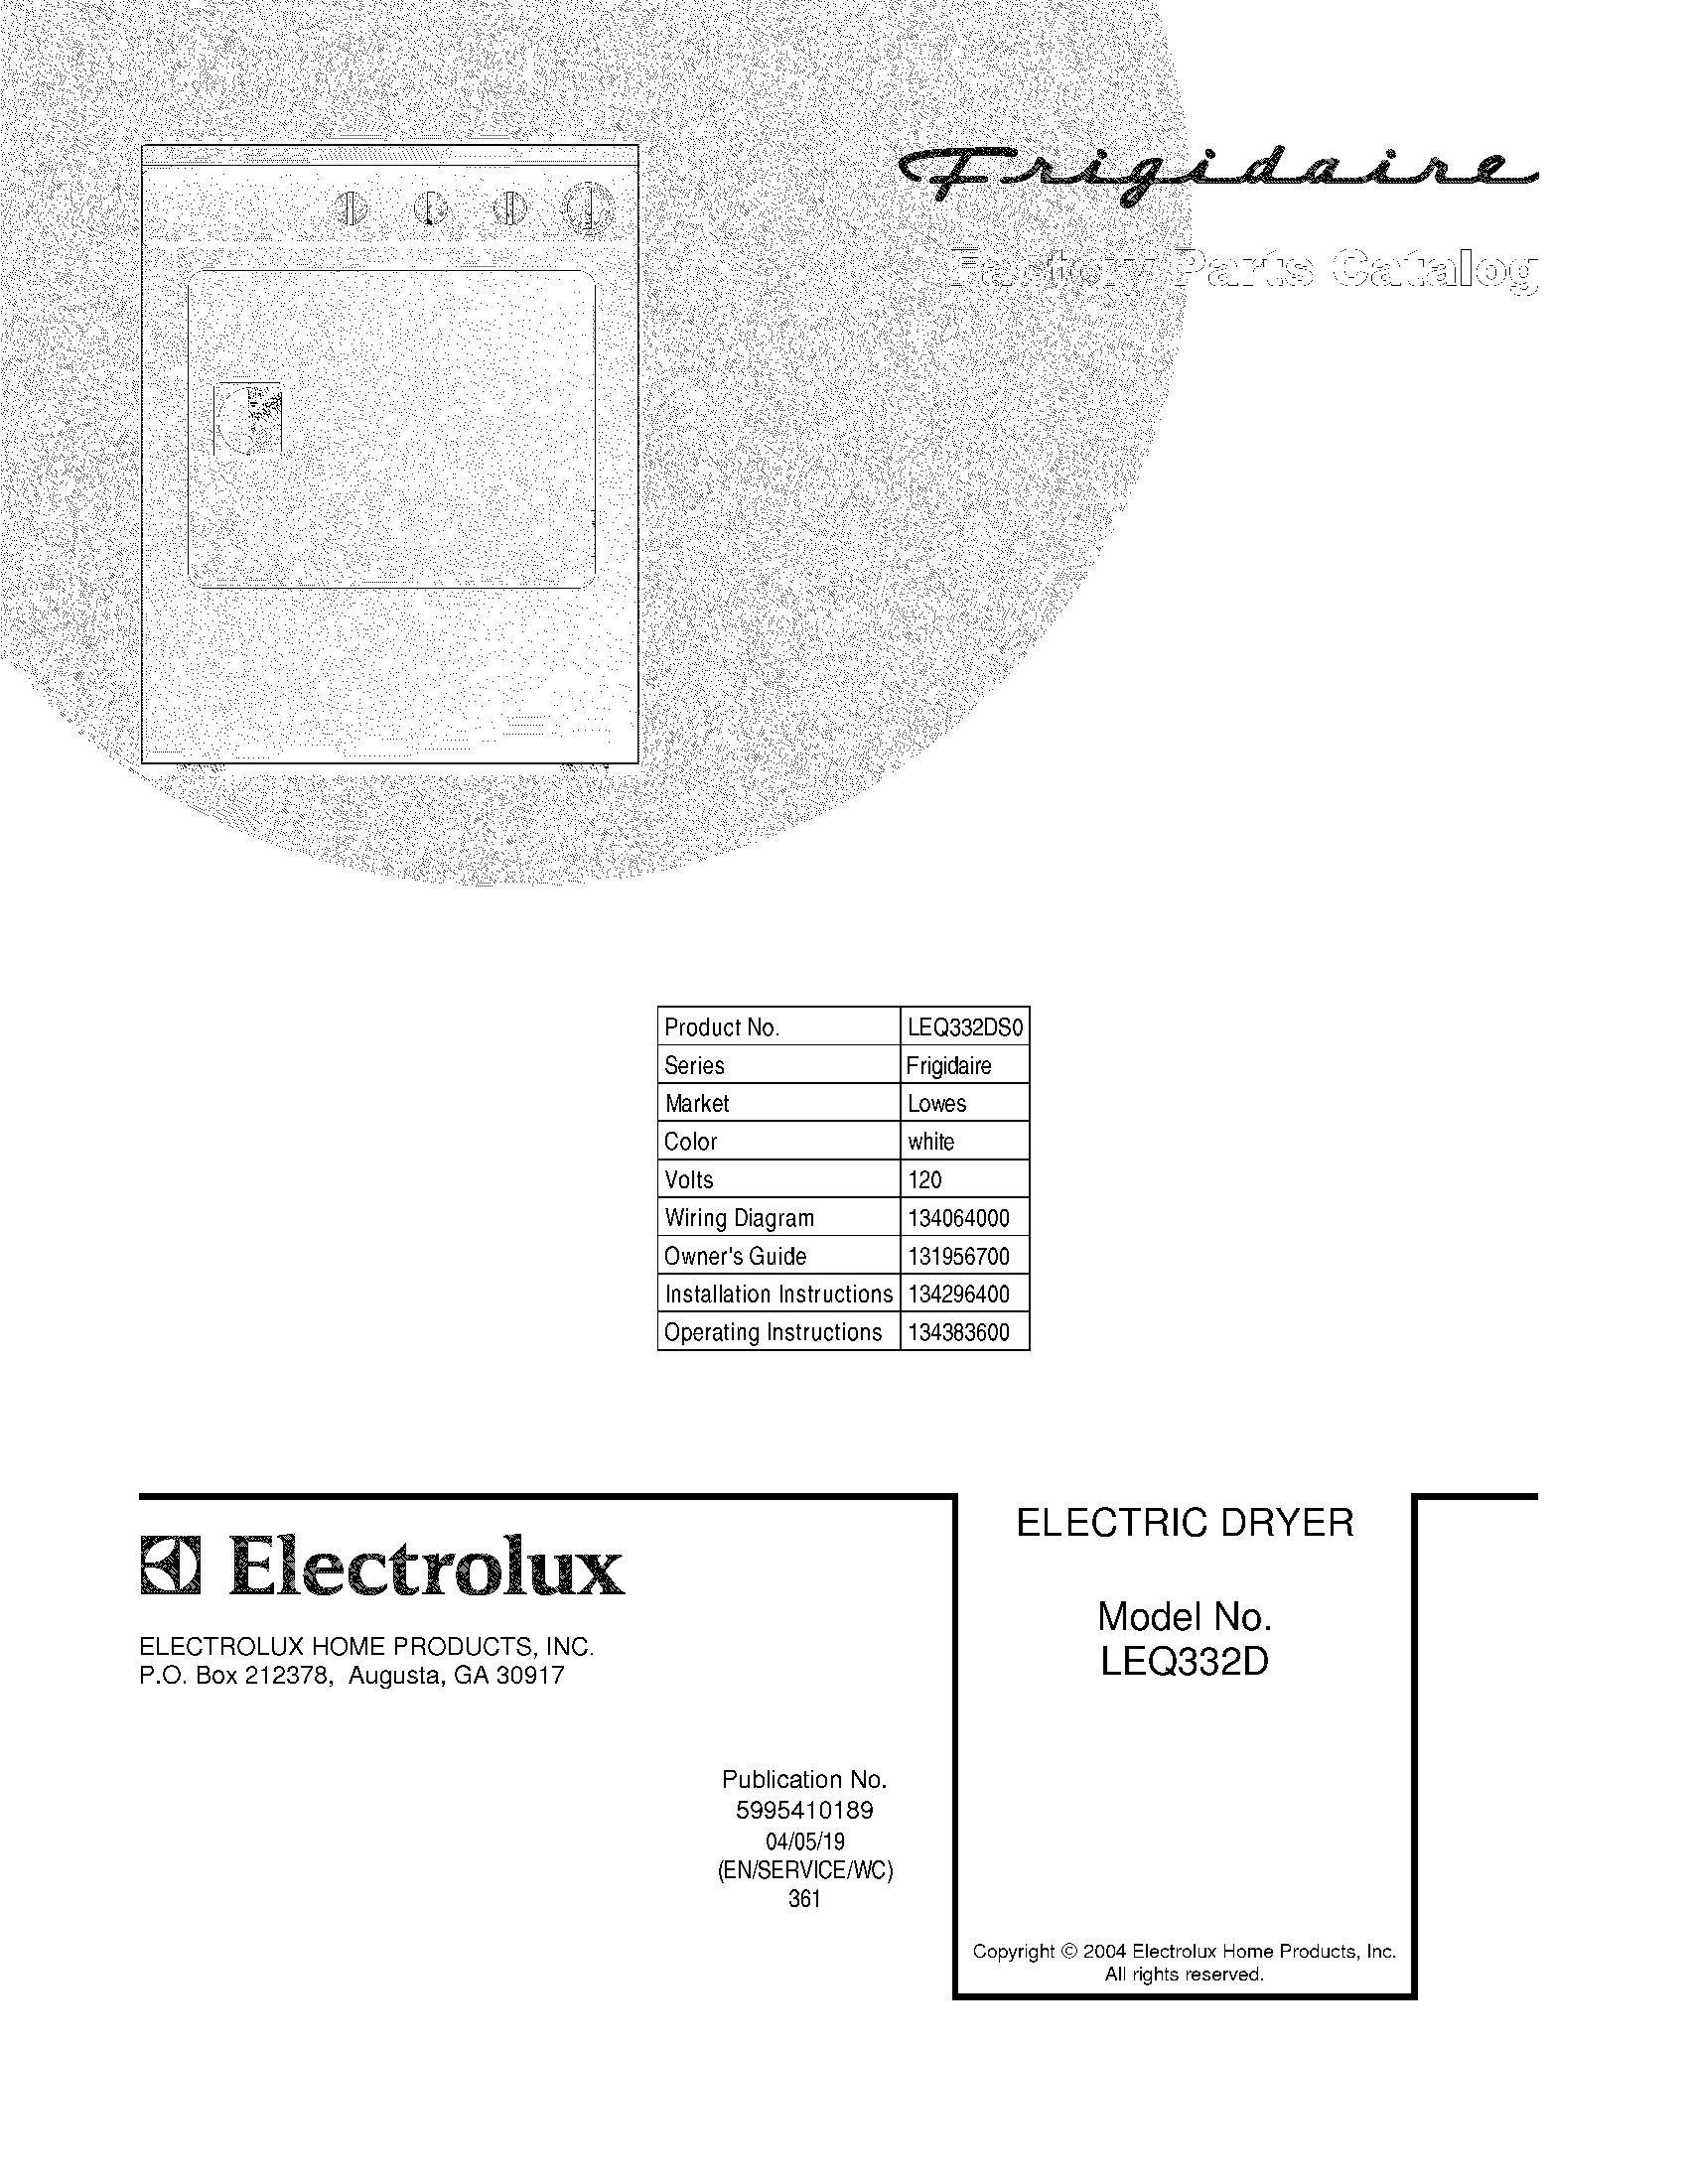 GE_7622] Hewescraft Wiring Diagram Download DiagramFeren Kicep Mohammedshrine Librar Wiring 101